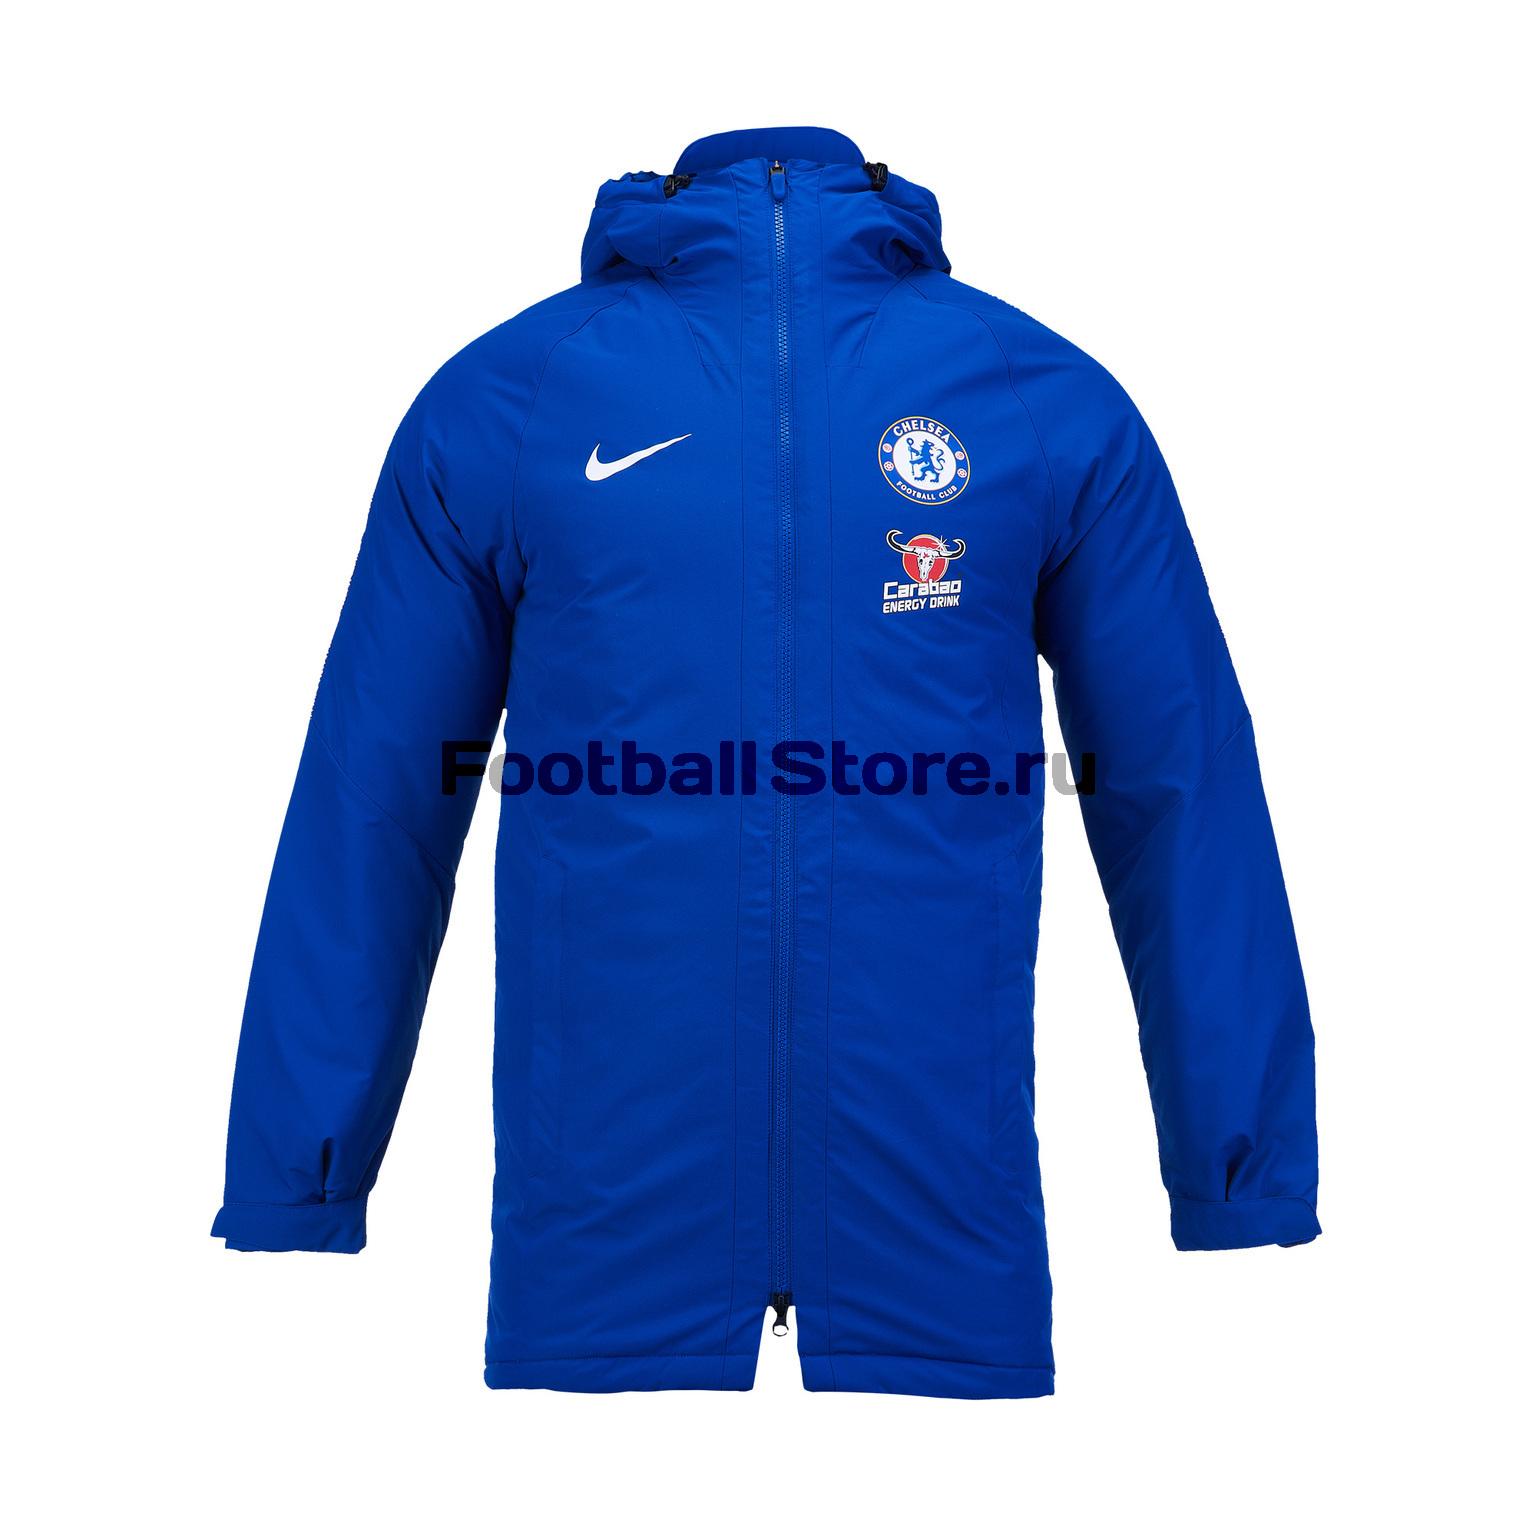 Куртка Nike Chelsea Squad Jacket AJ3057-496 спортивная куртка nike as shield light jacket 3m 642361 496